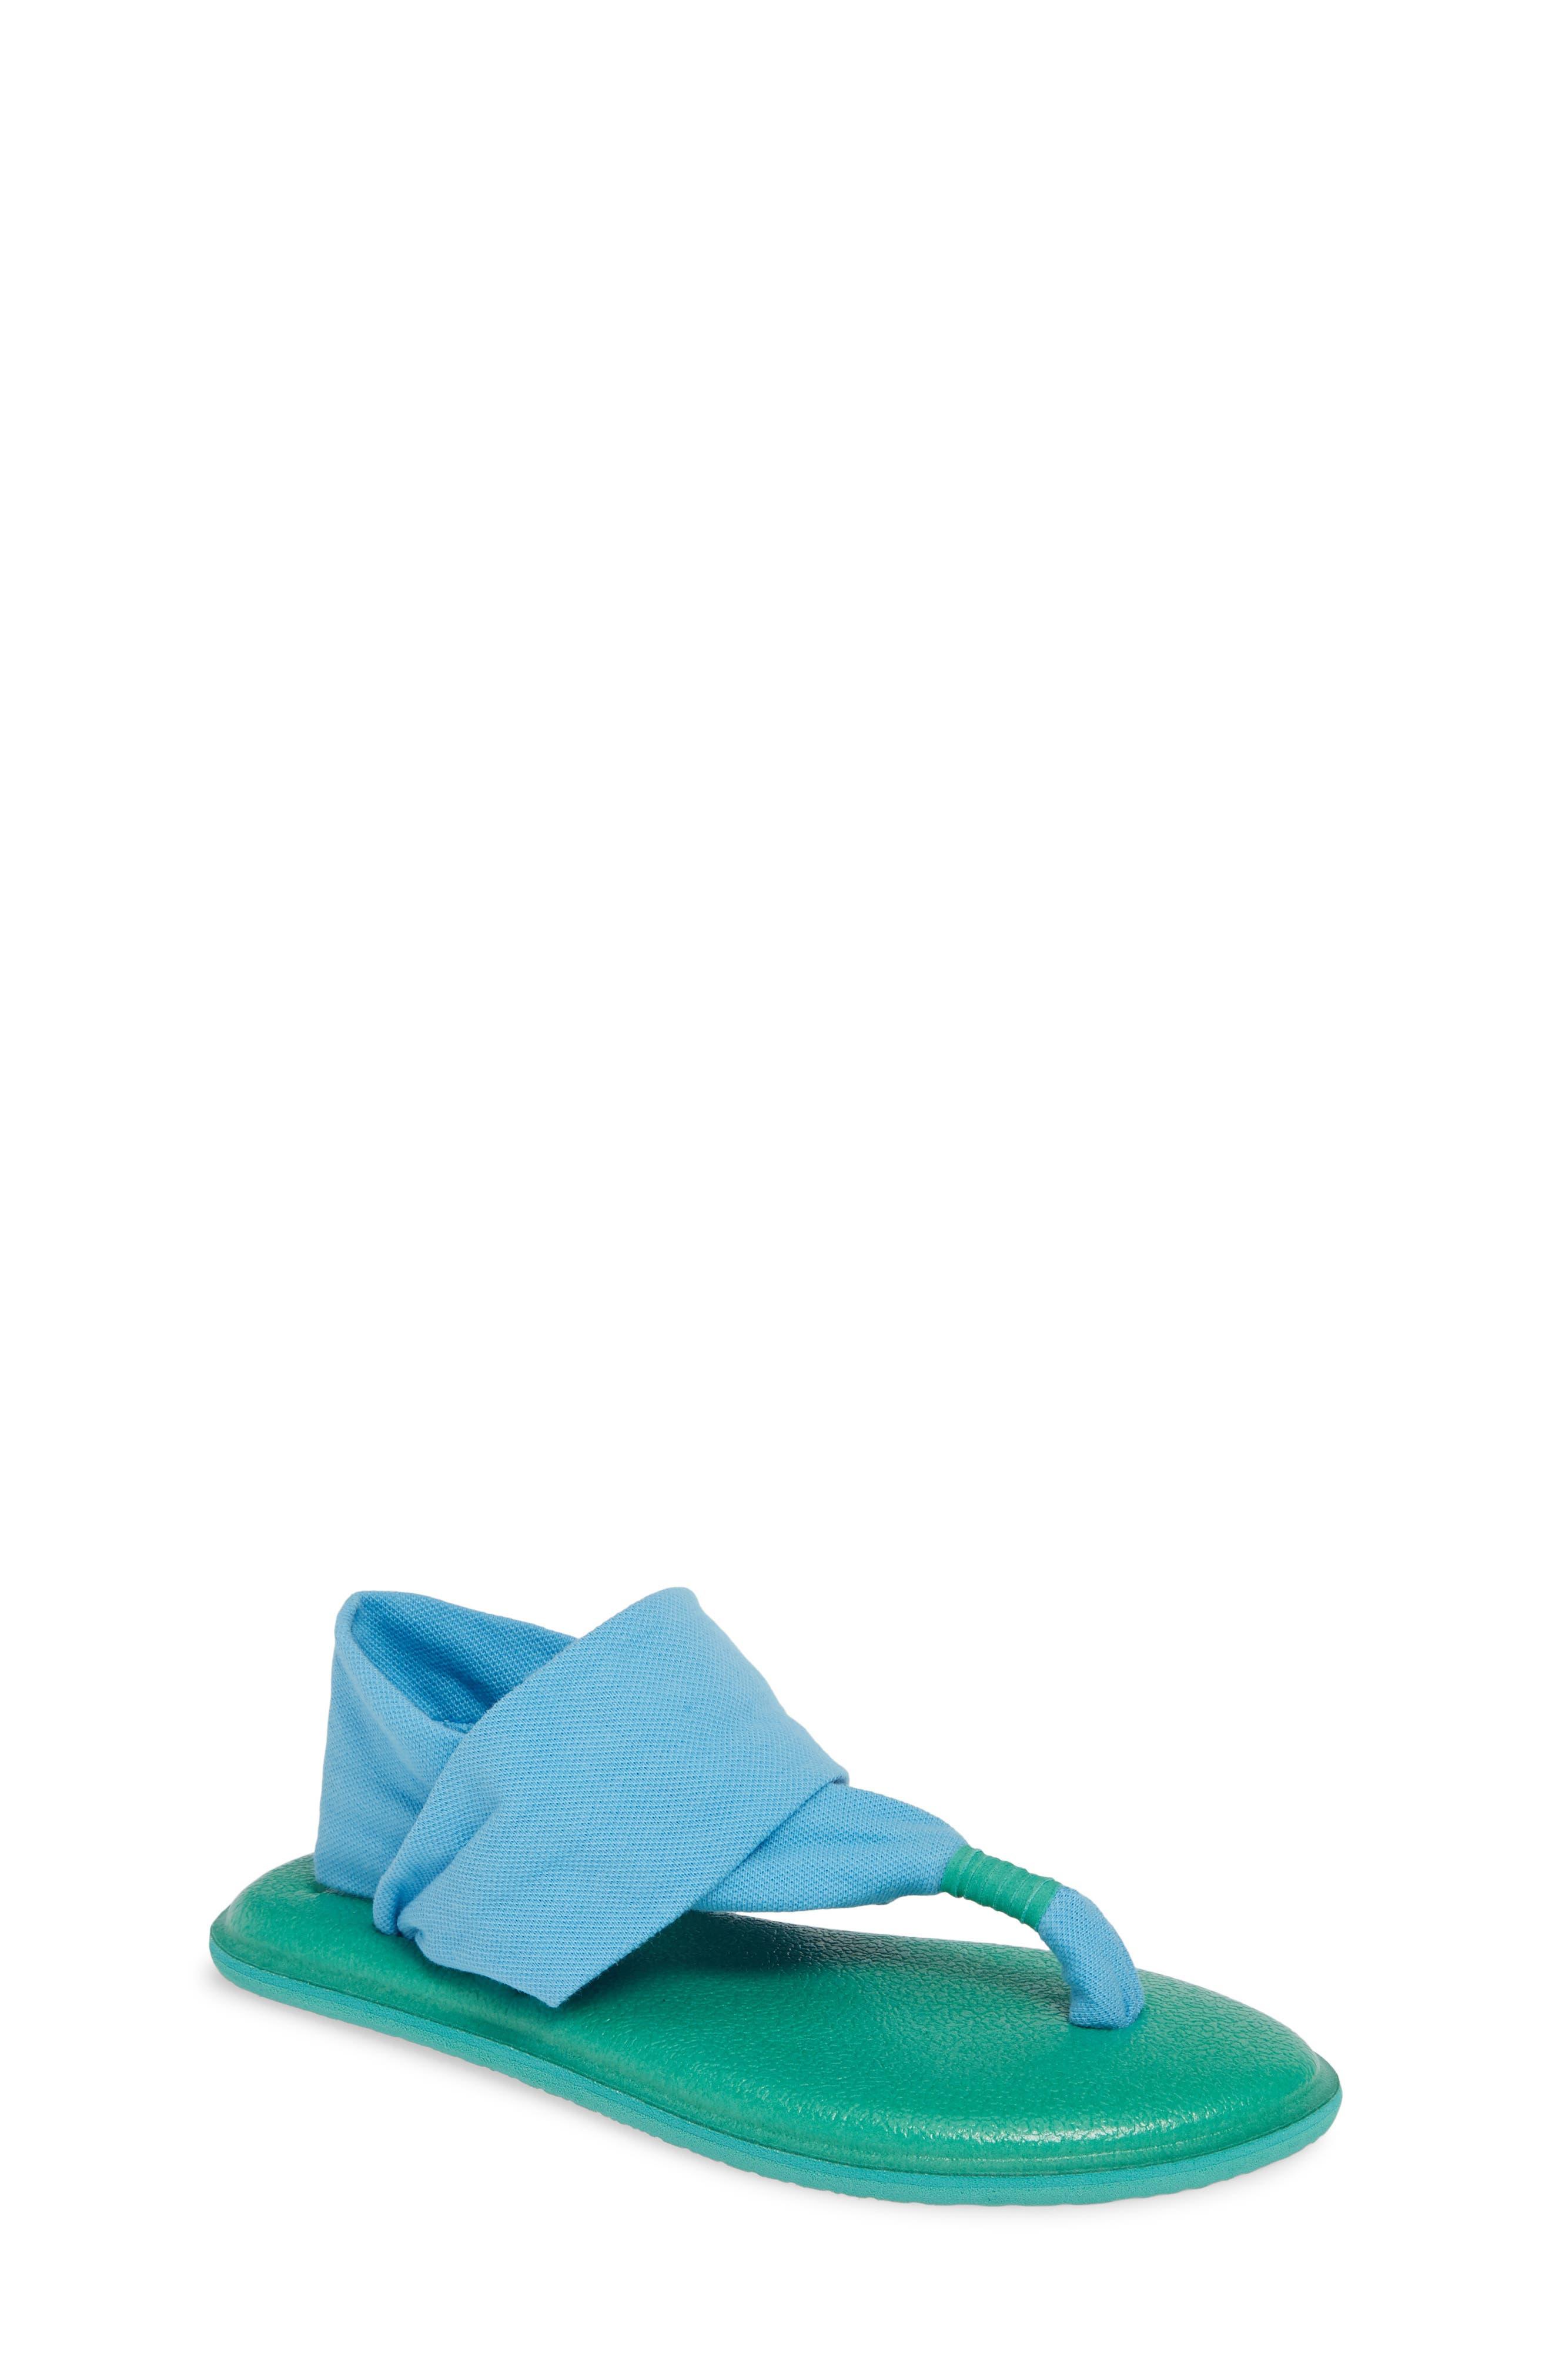 Toddler Girls Sanuk Lil Yoga Sling 2 Sandal Size 1112 M  Blue